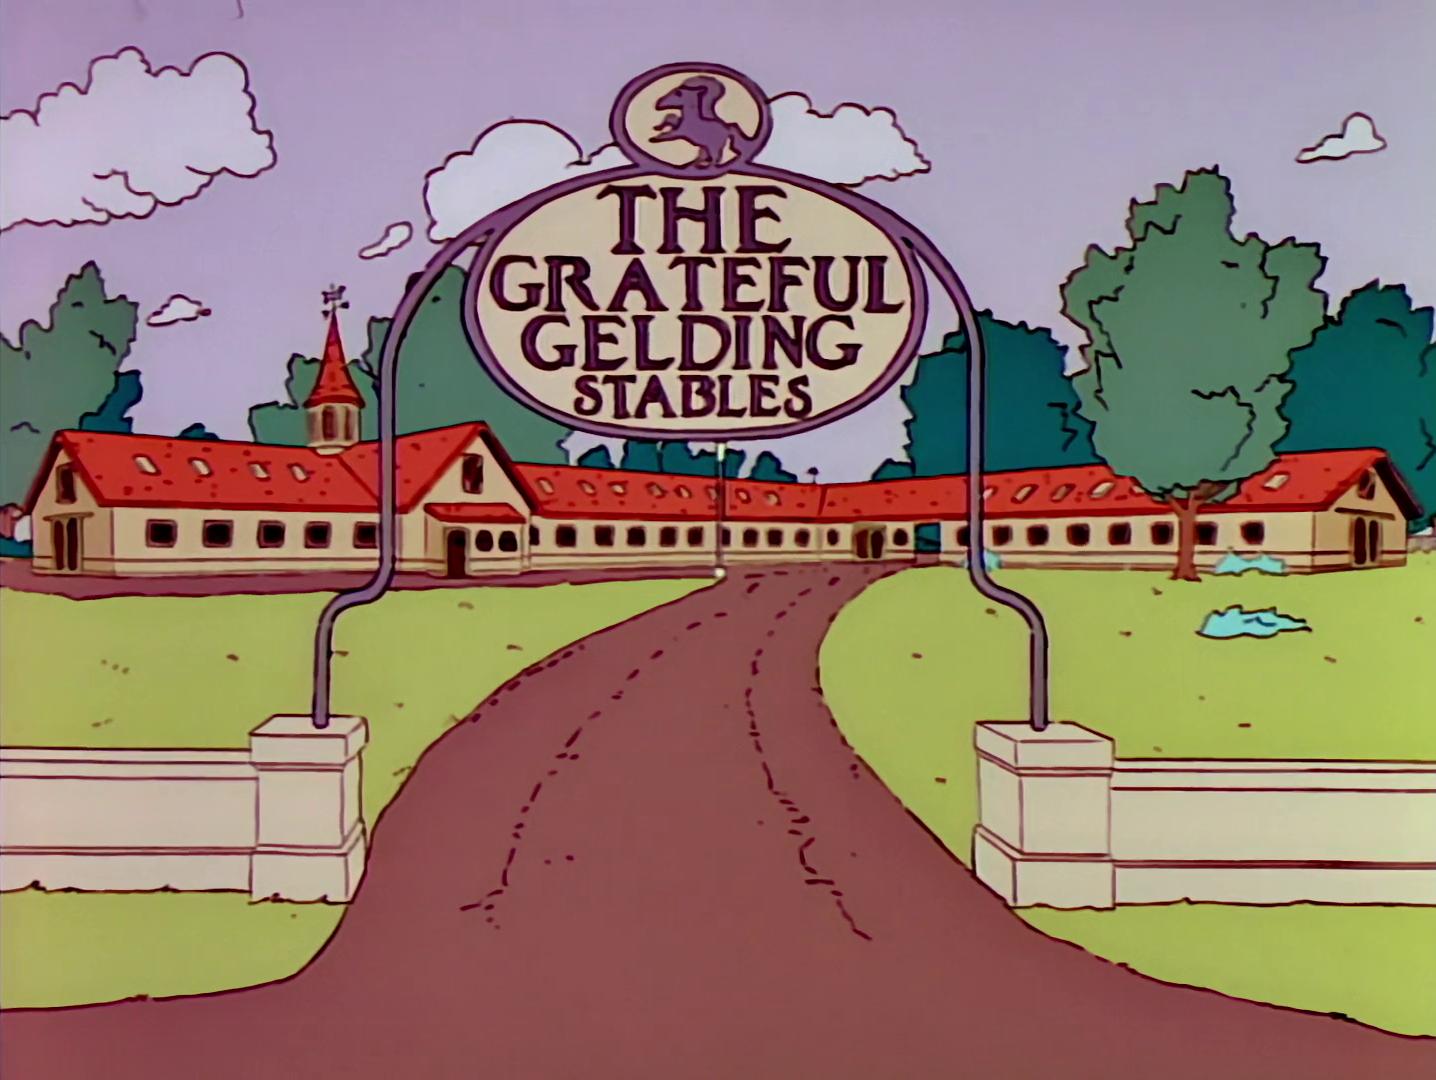 File:The Grateful Gelding Stables.png